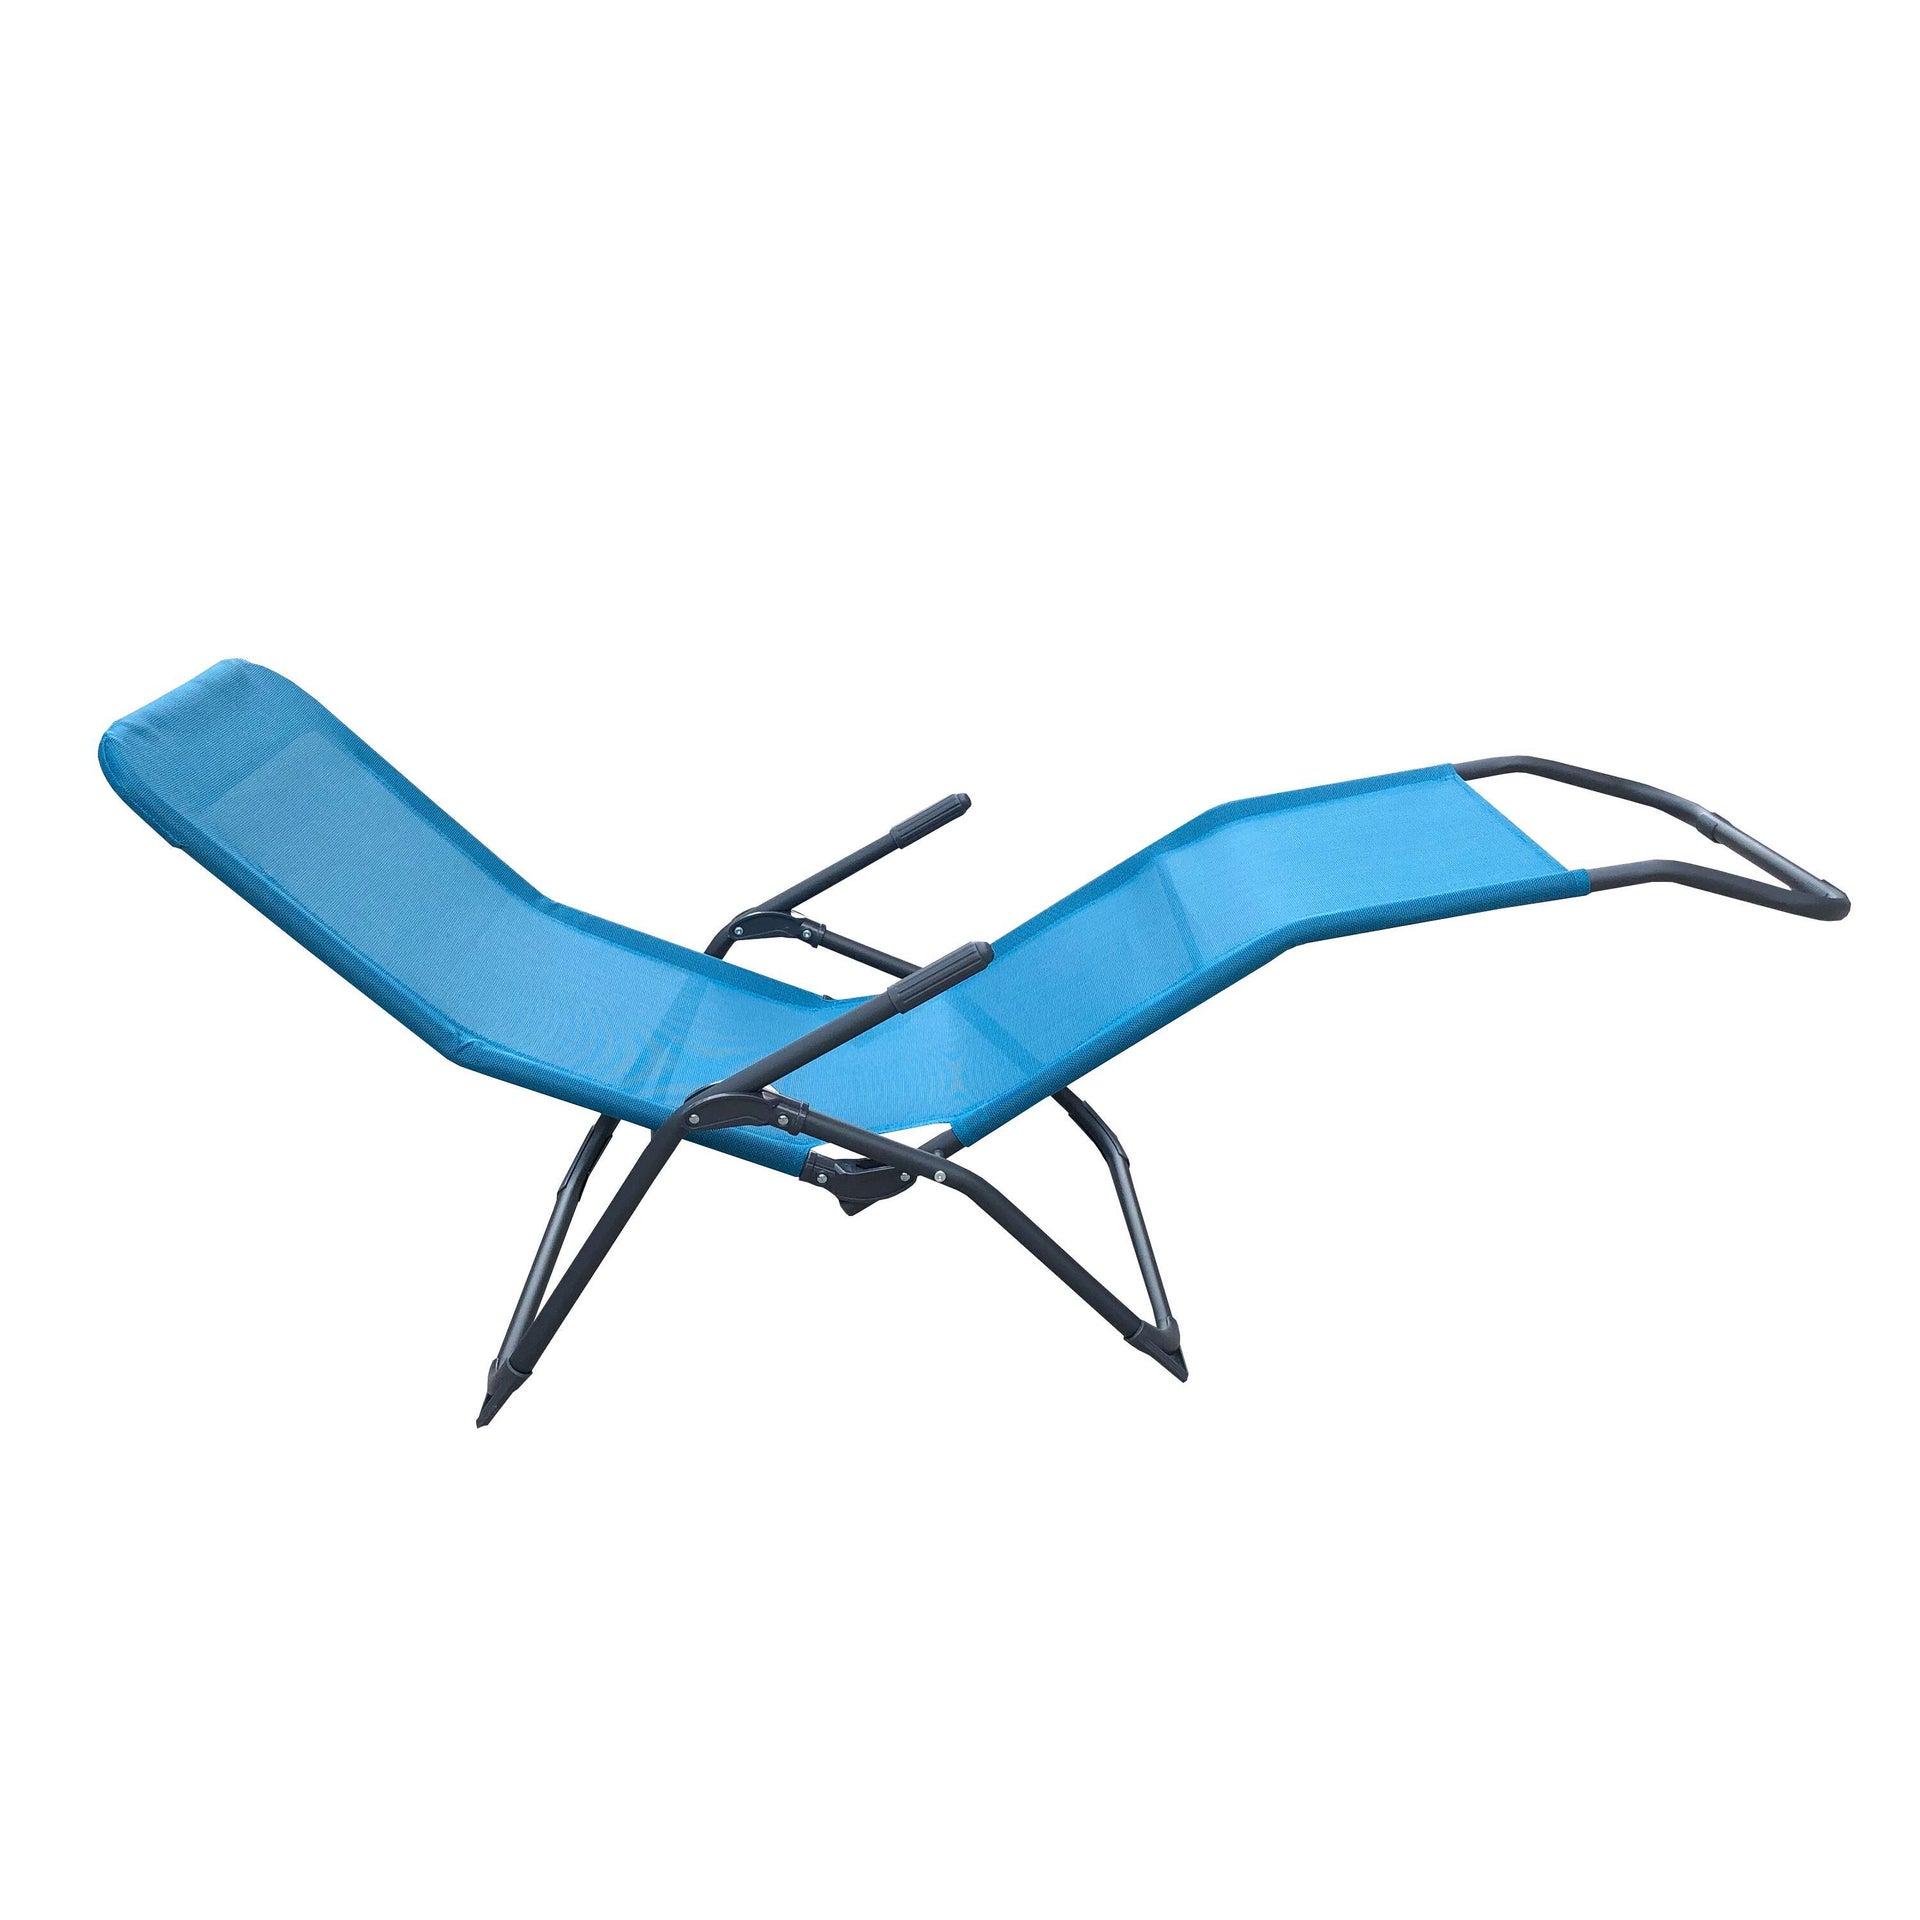 Lettino senza cuscino Fiesta in acciaio blu - 6